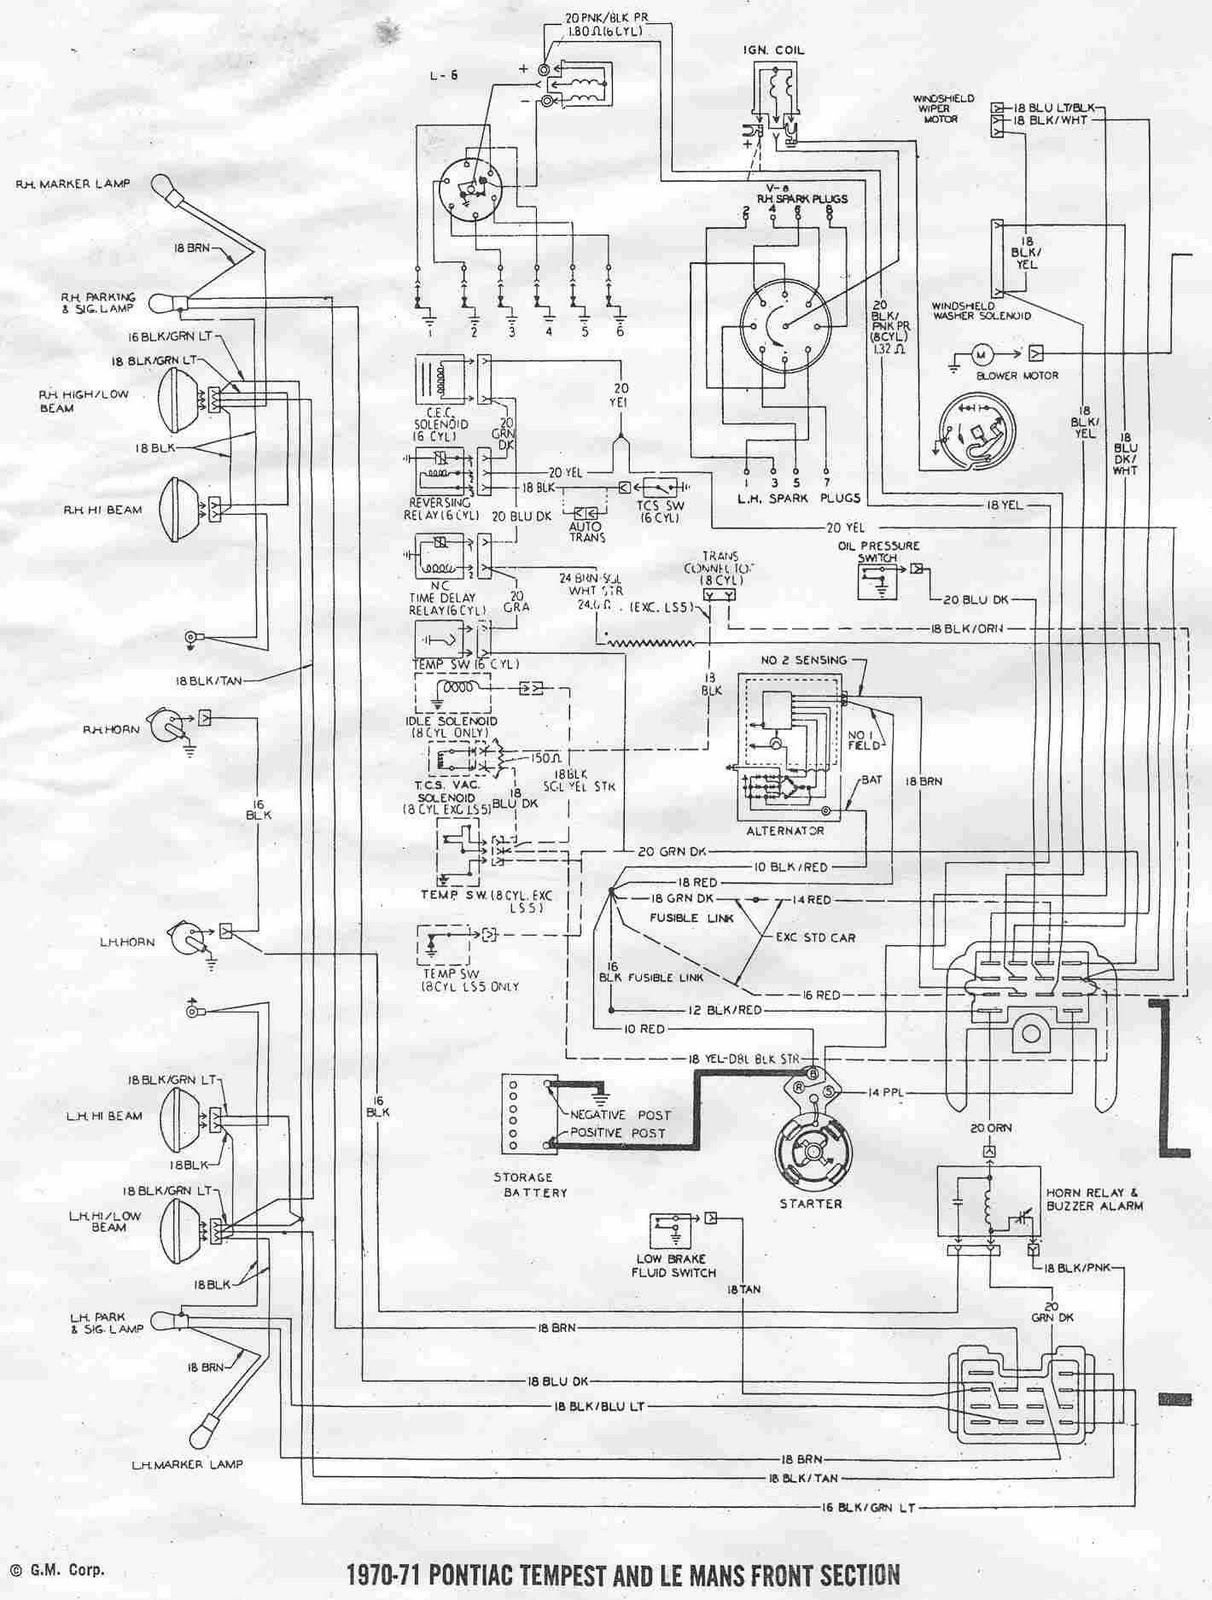 hight resolution of 1967 pontiac lemans wiring diagram wiring diagrams rh 34 jennifer retzke de 1964 pontiac gto wiring